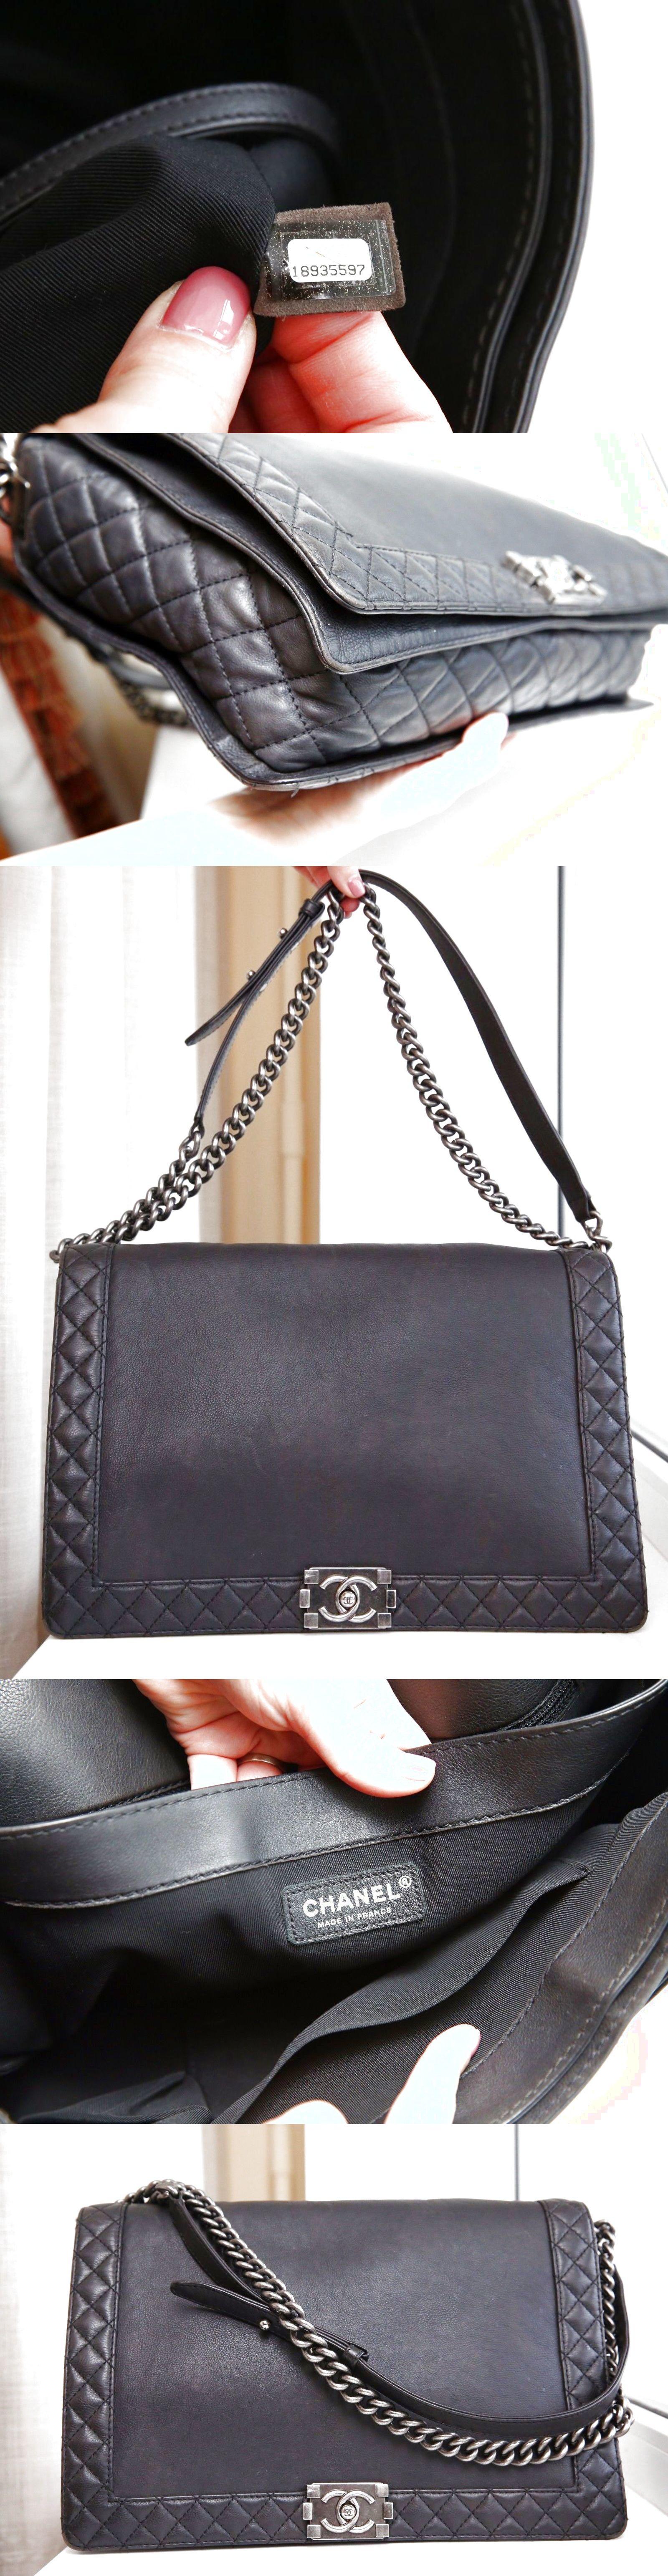 f42e2c60cf5a VERIFIED Authentic Chanel Black Calfskin Large Maxi Boy Reverso Flap Bag  $2499.0